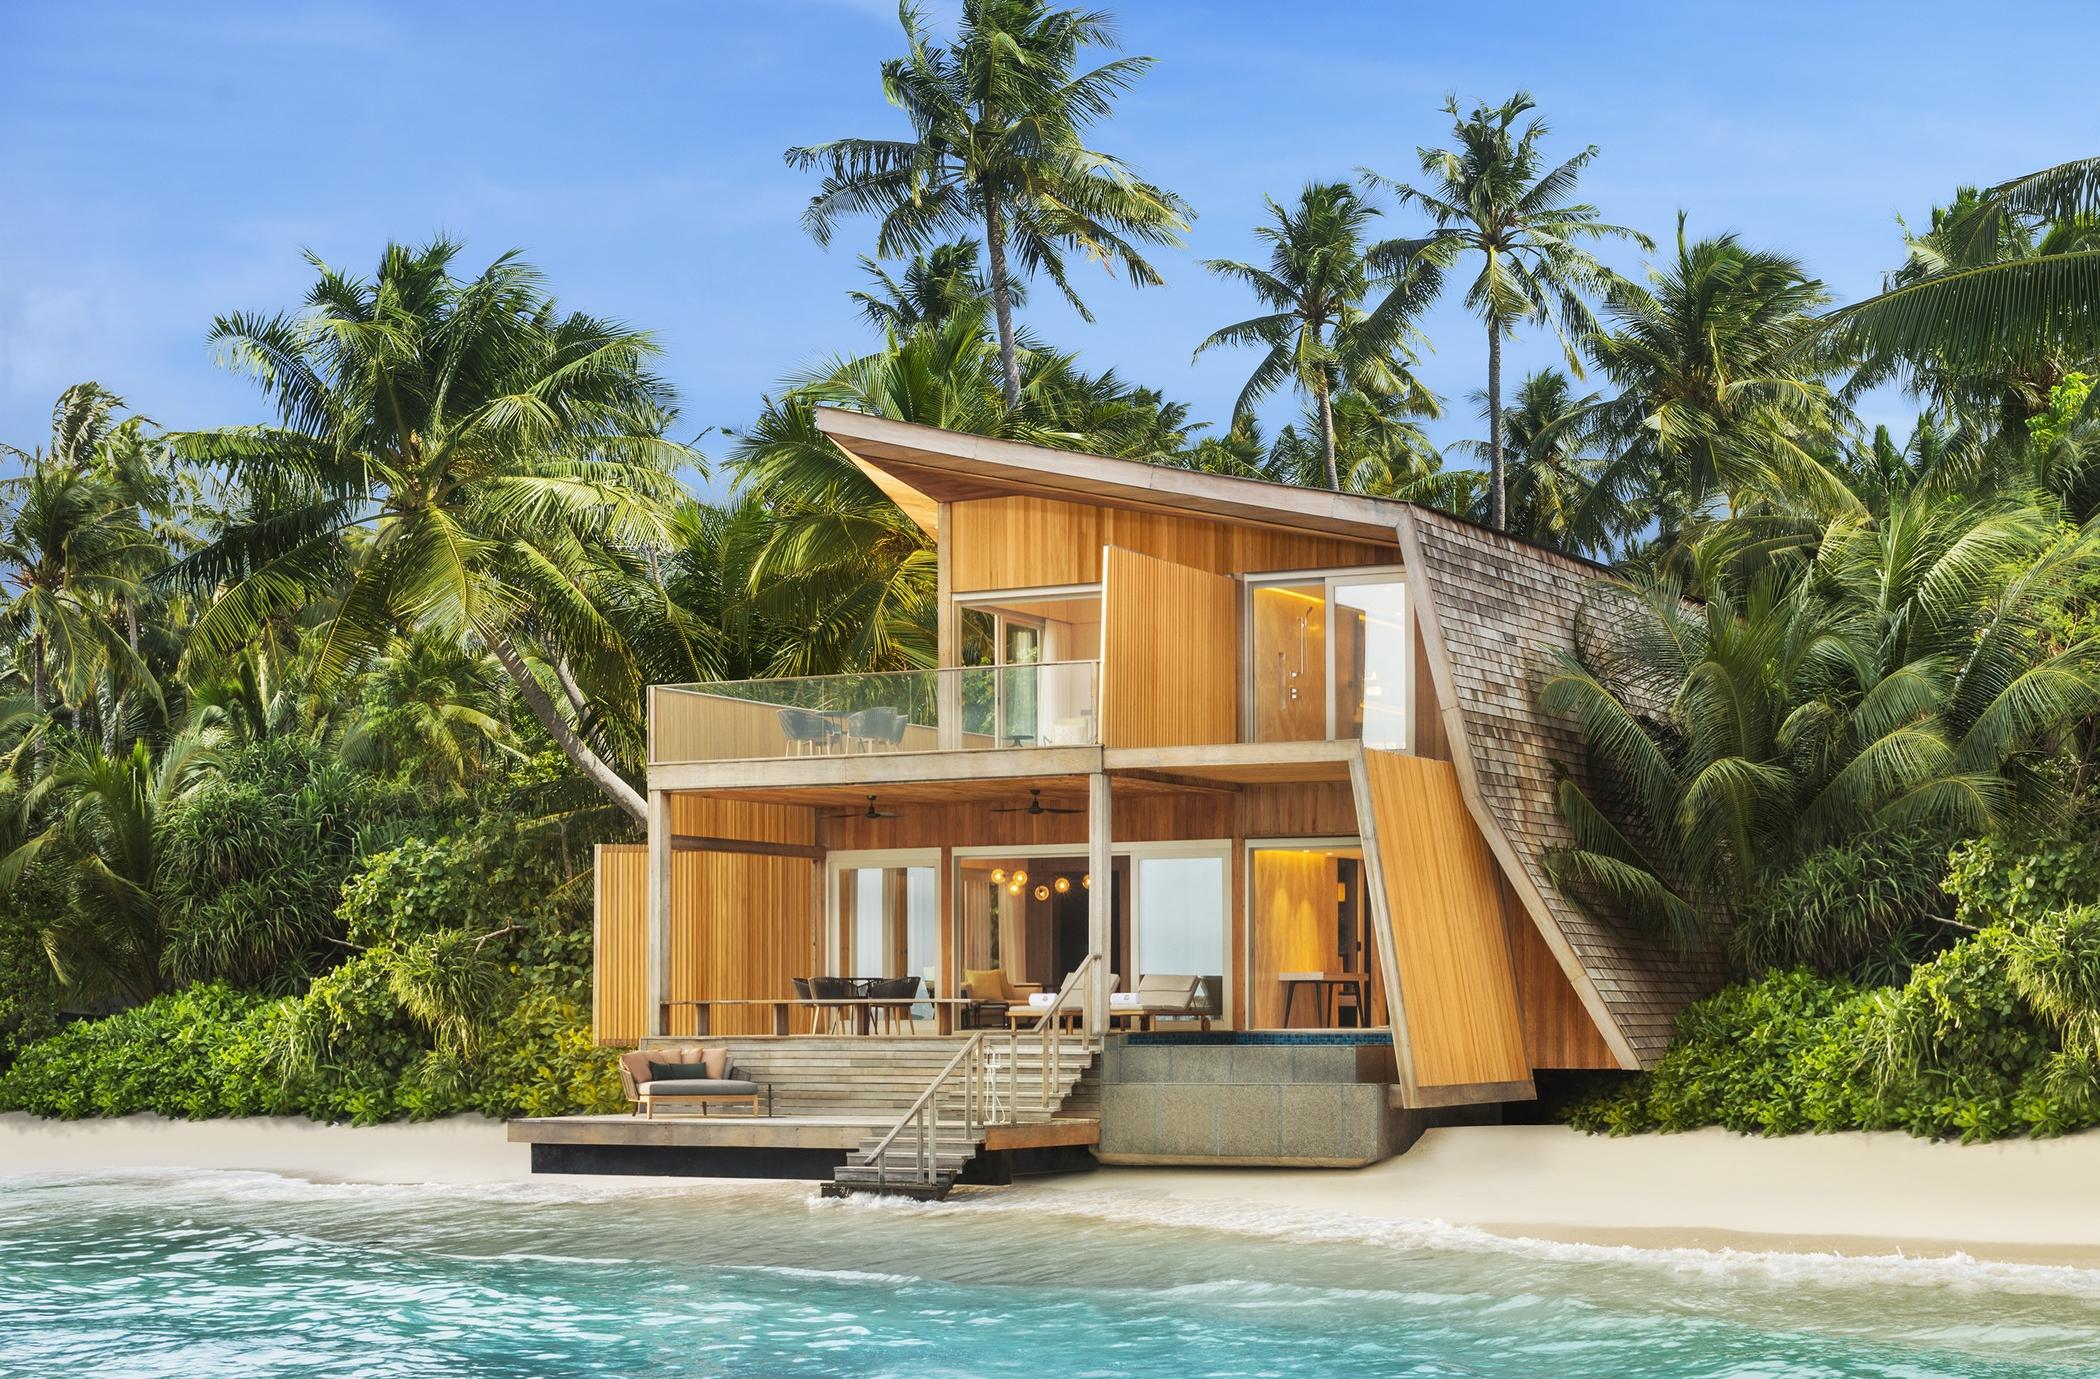 str4315ex-195094-Two-Bedroom Family Villa with Pool - Exterior-Med.jpg